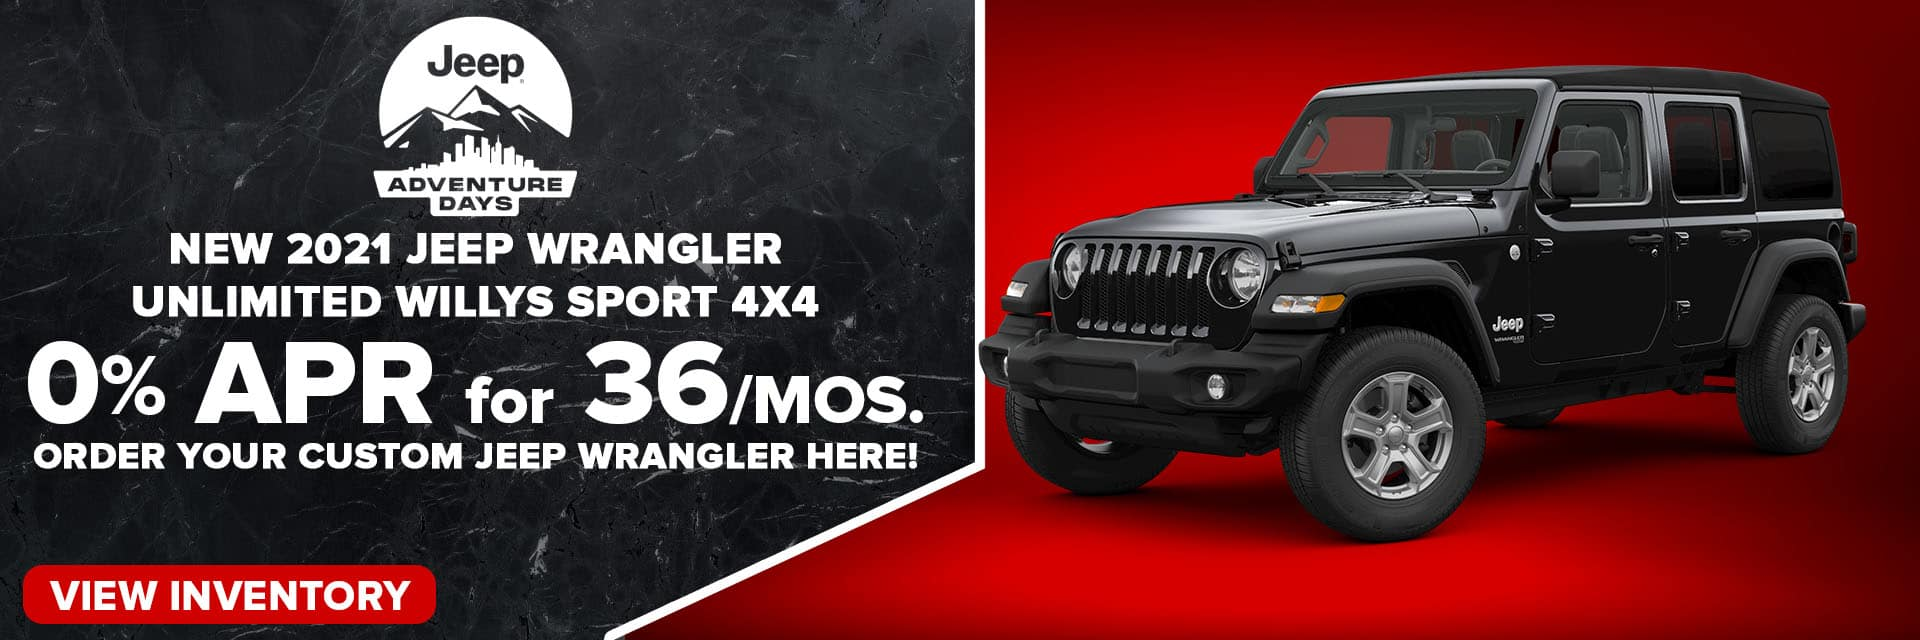 CLGO-September 2021-2021 Jeep Wrangler copy